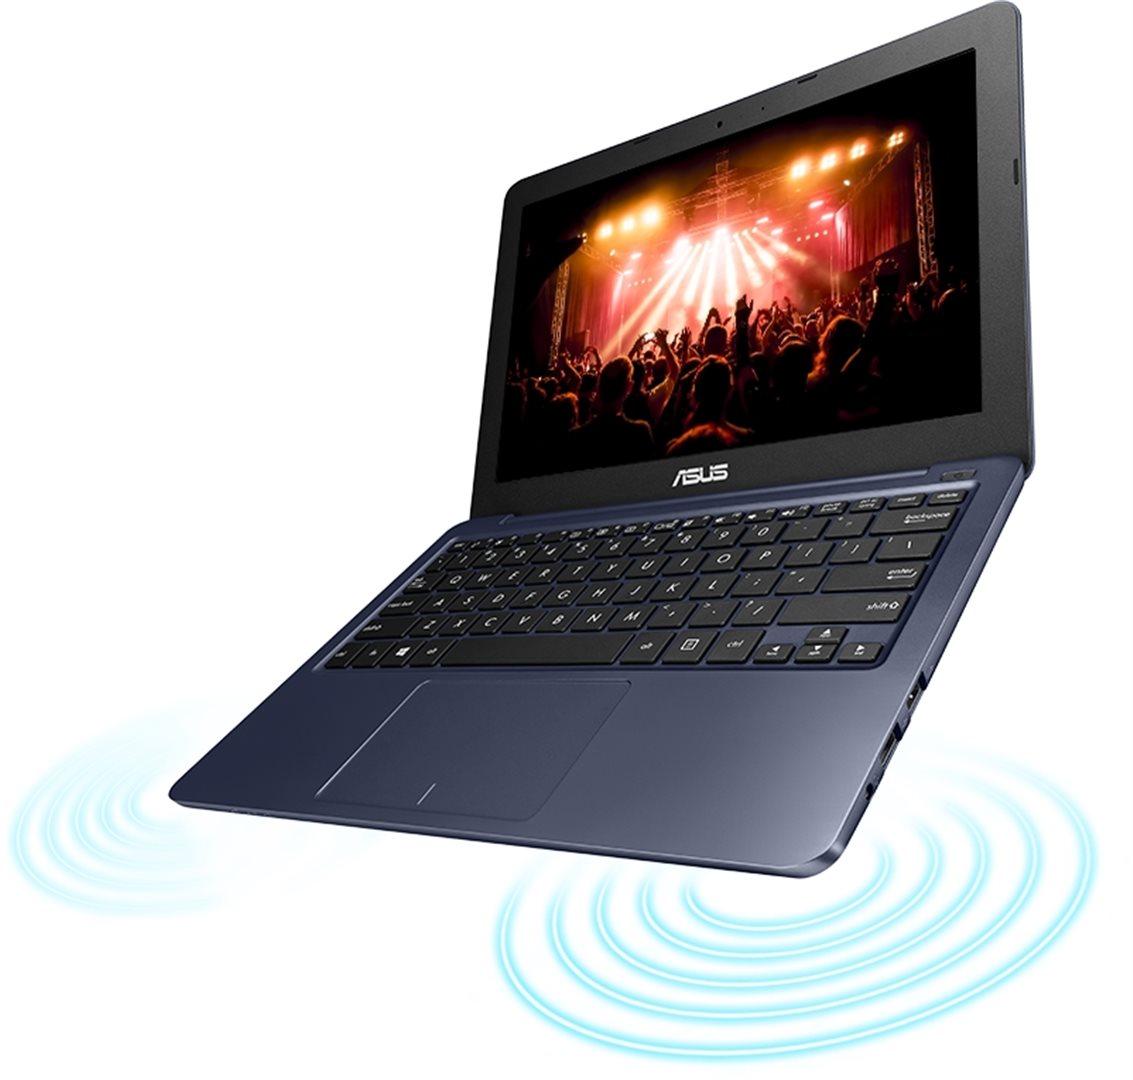 ASUS E202SA 11,6/N3050/500GB/4G/B/Win 10, modrý